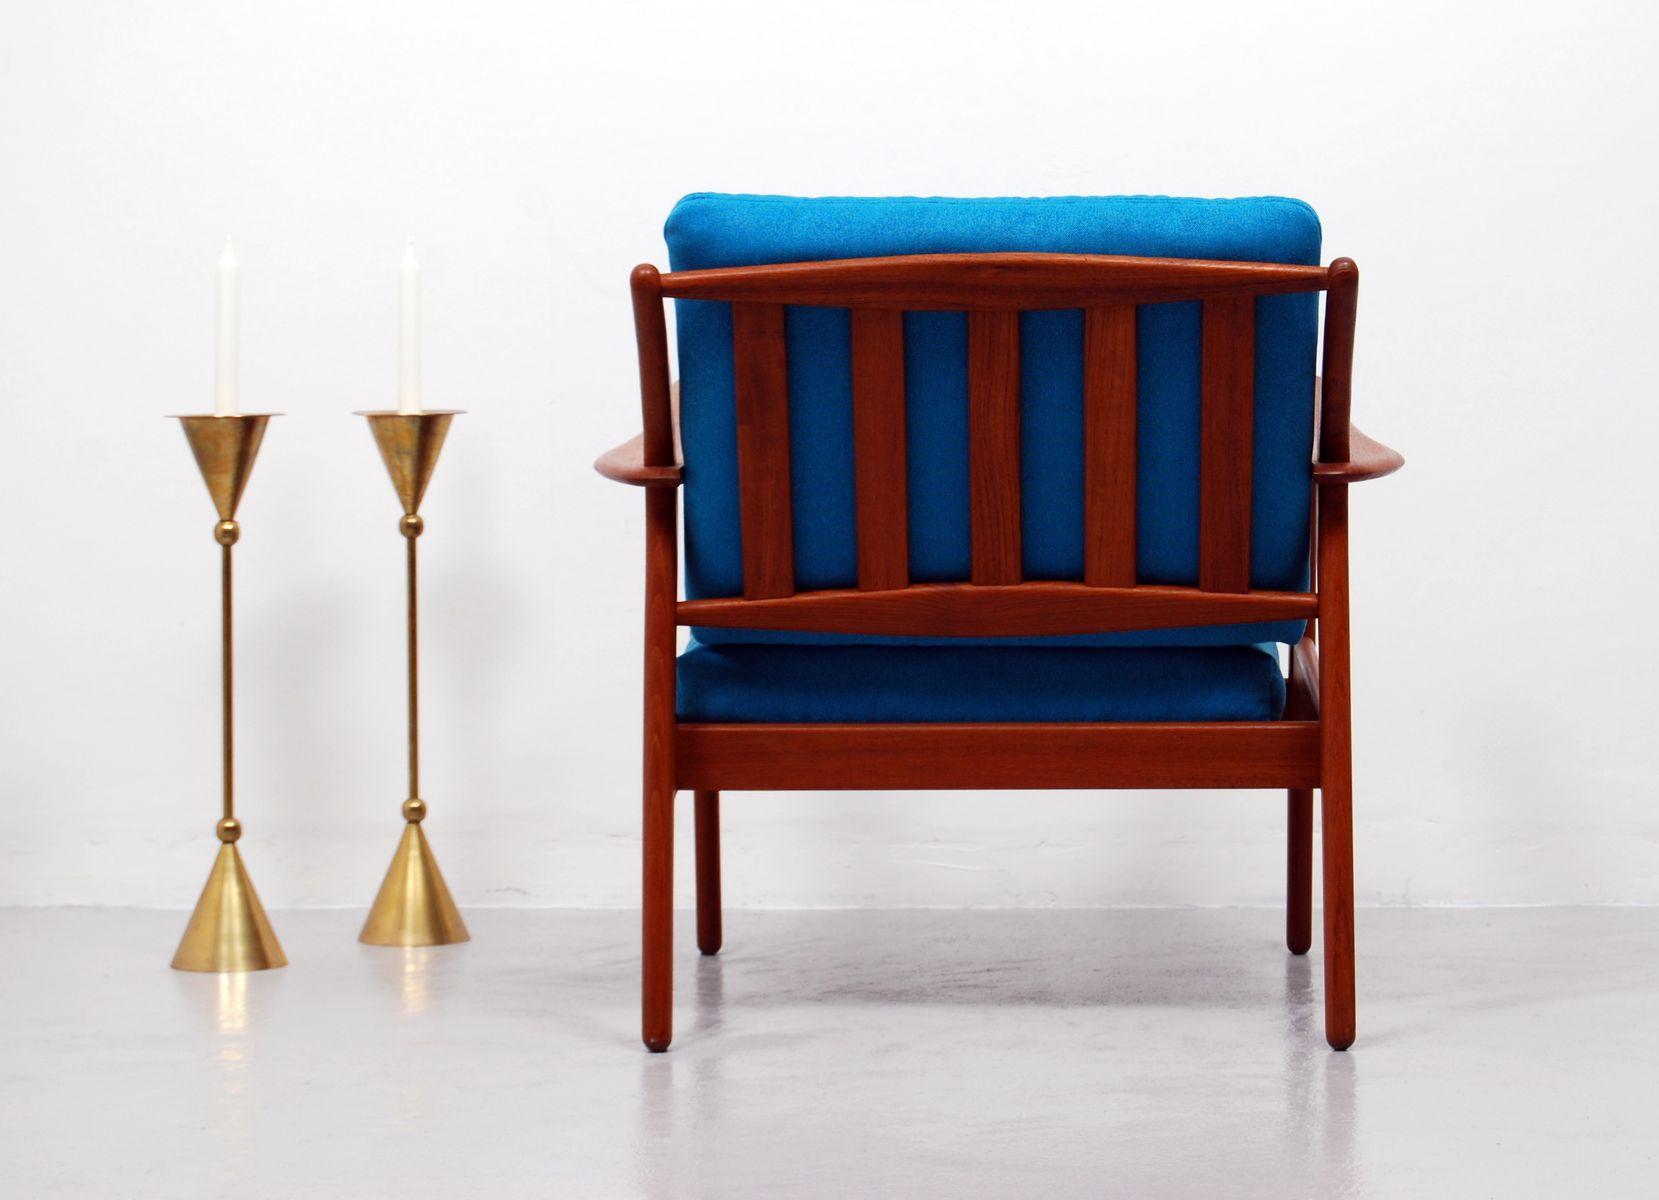 Vintage Danish Hans Teak Lounge Chair by Niels Koefoed for Hornslet Møbelfabr